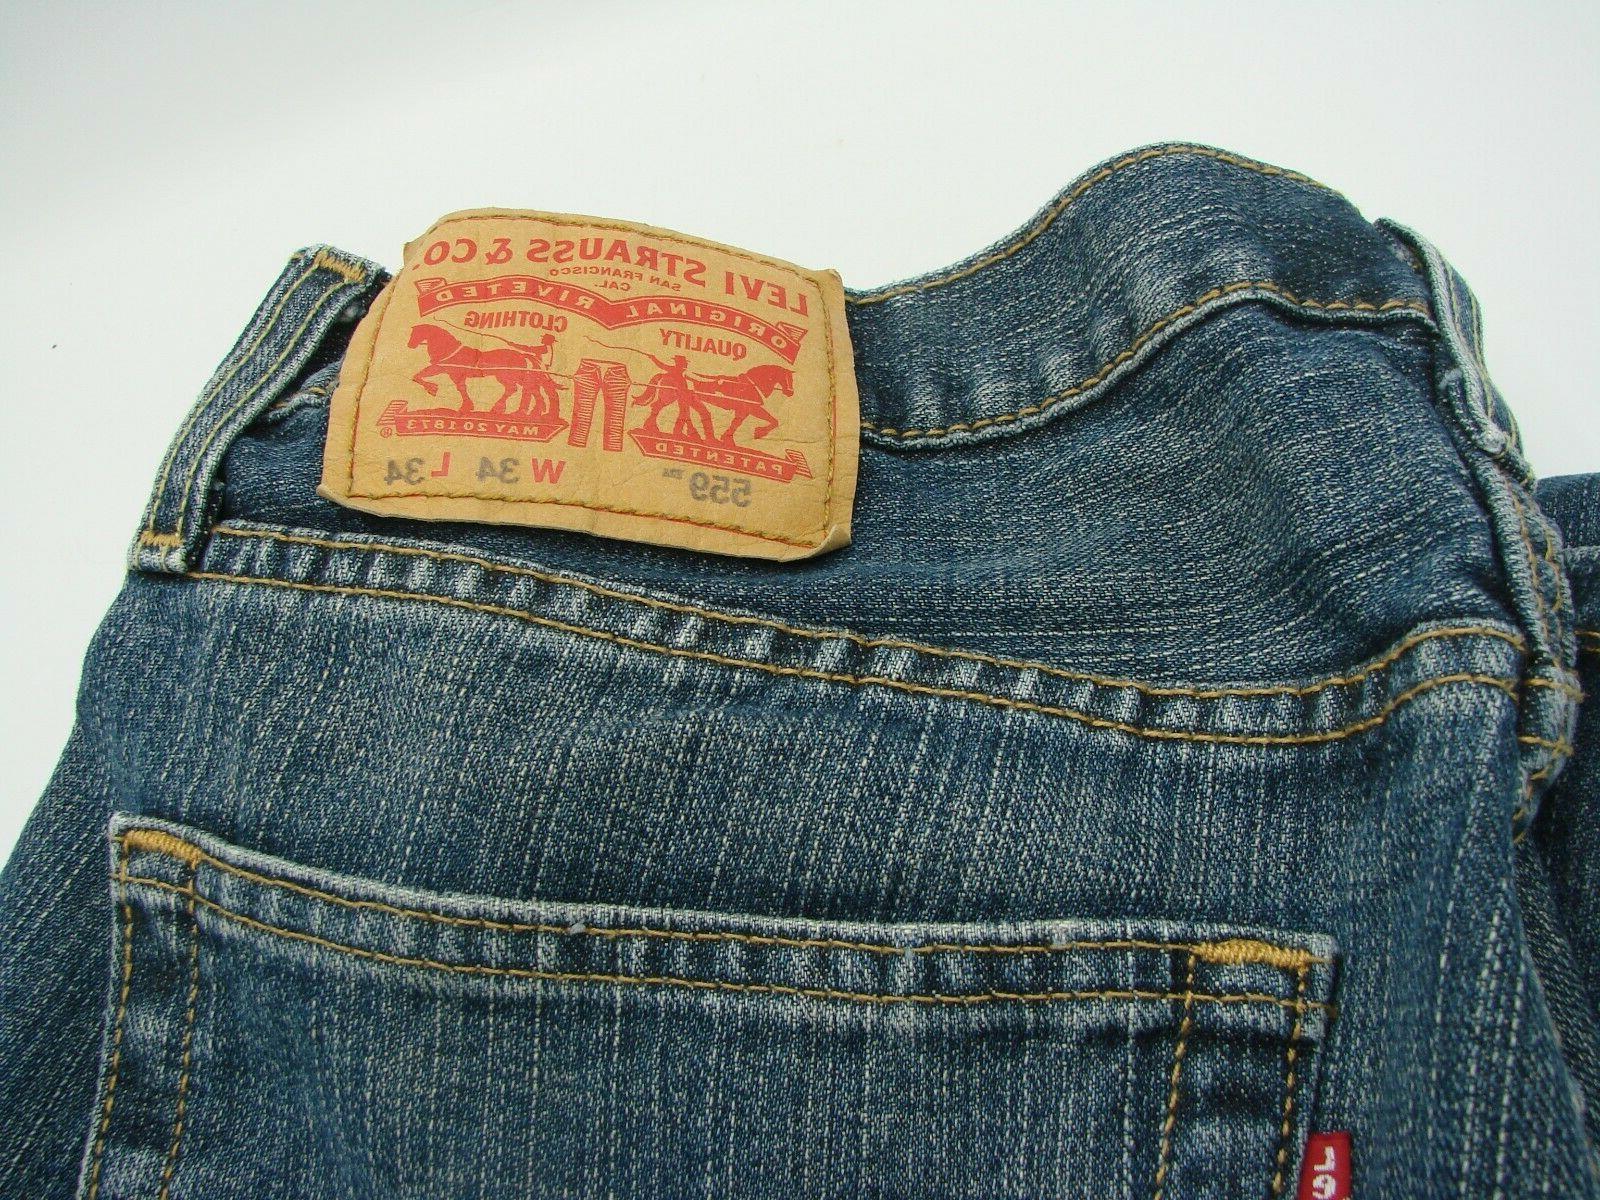 Straight Jean, Range, 34W x 2765 CW-2518